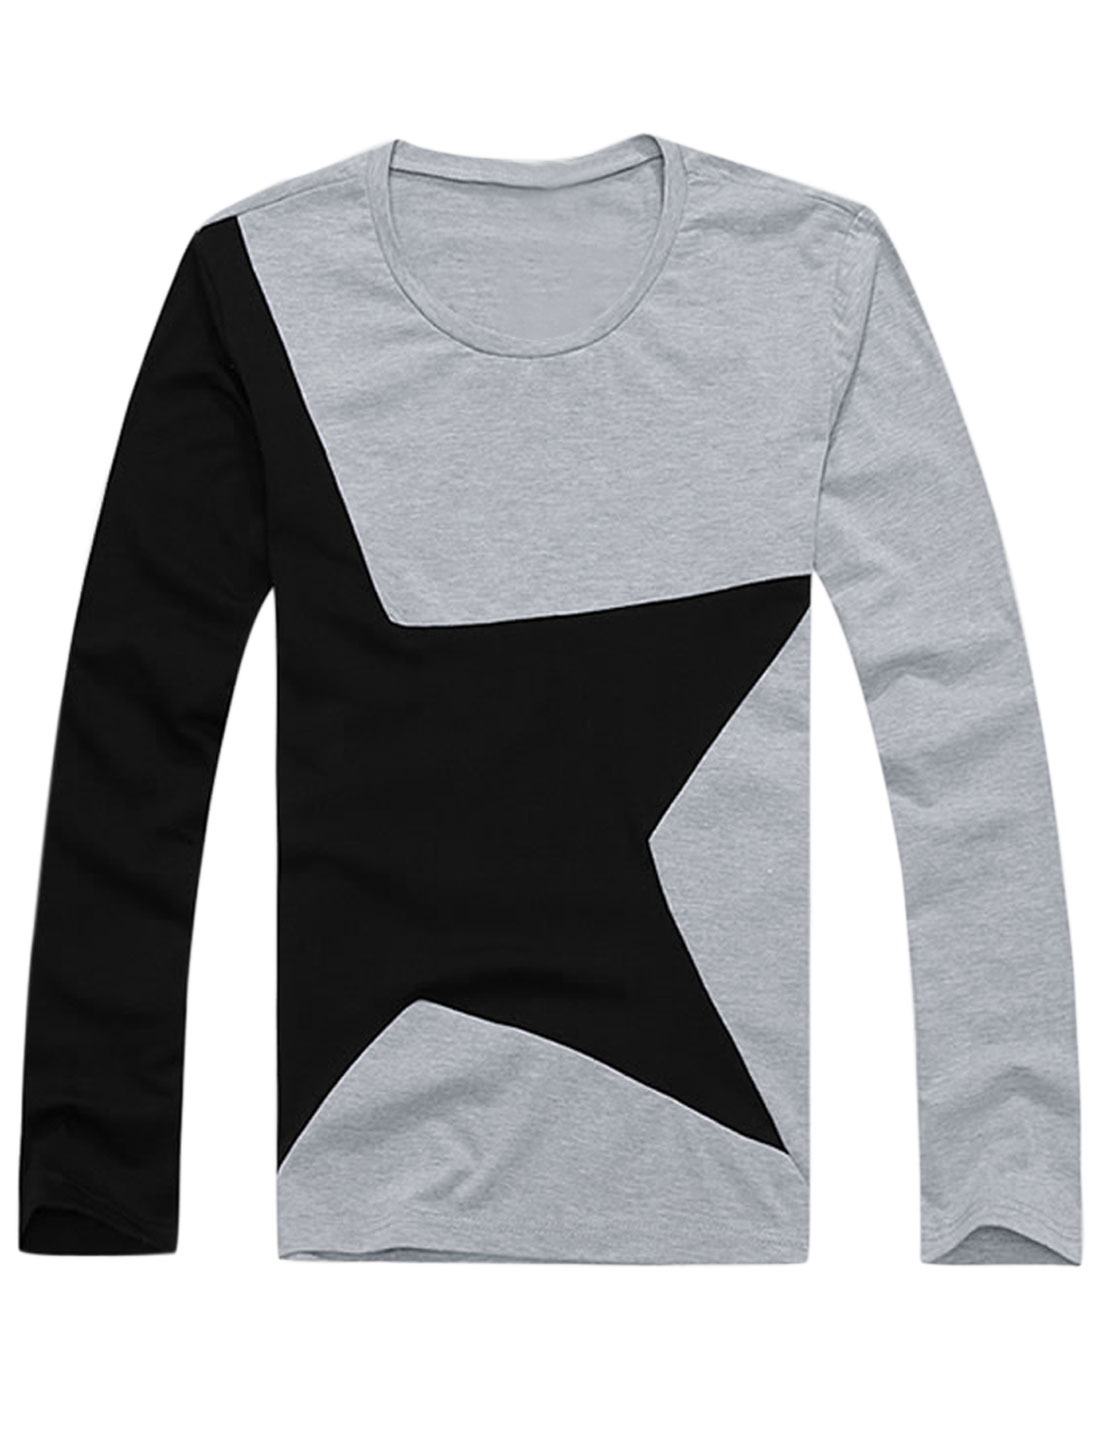 Men Long Sleeve Star Prints Colorblock Casual T-Shirt Gray M